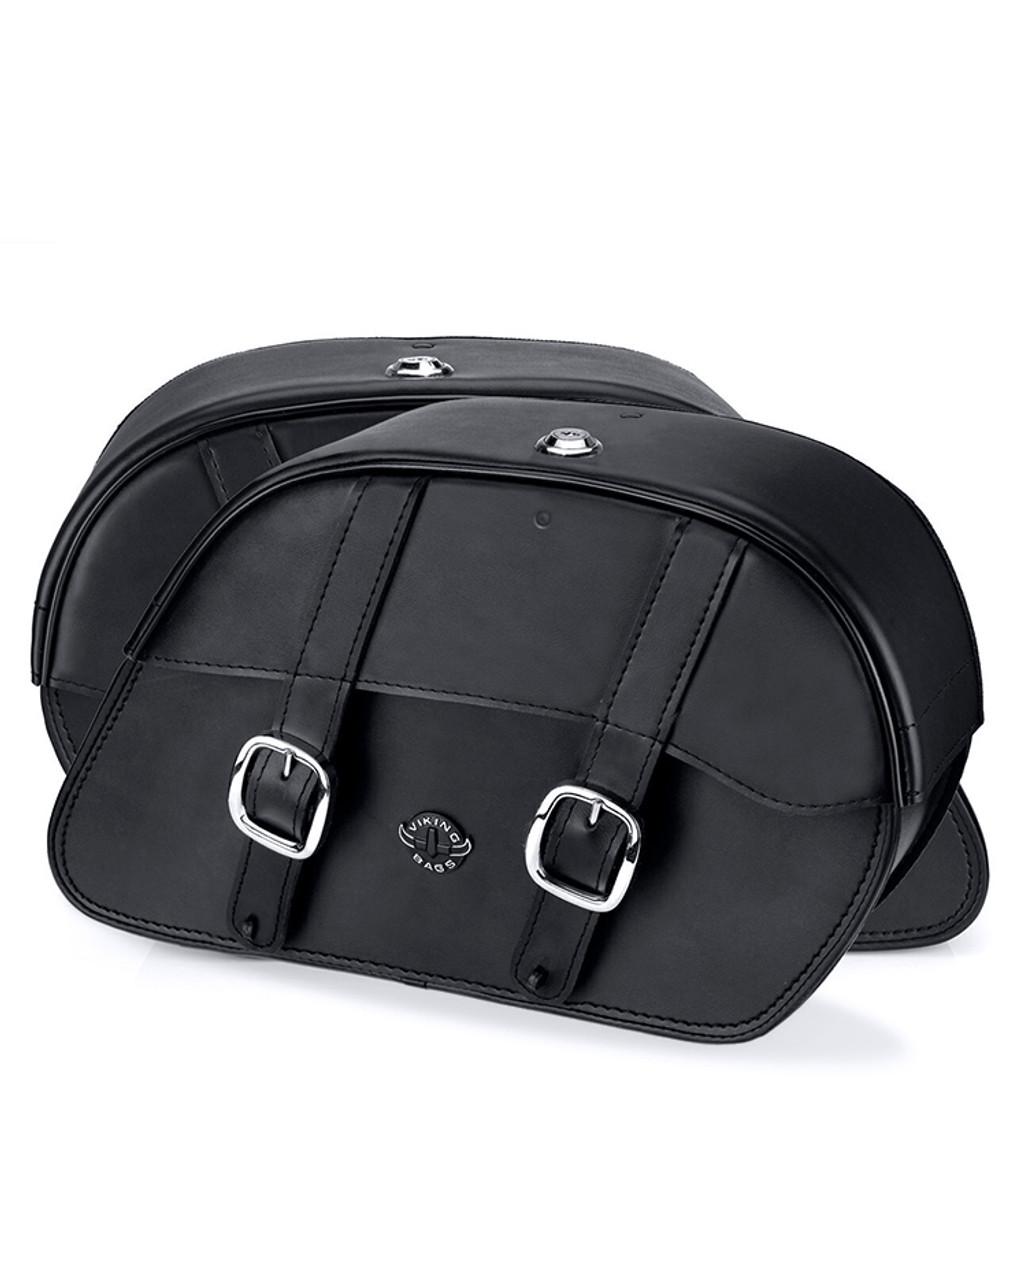 VikingBags Skarner Large Double Strap Yamaha V Star 950 Leather Motorcycle Saddlebags Both Bags View